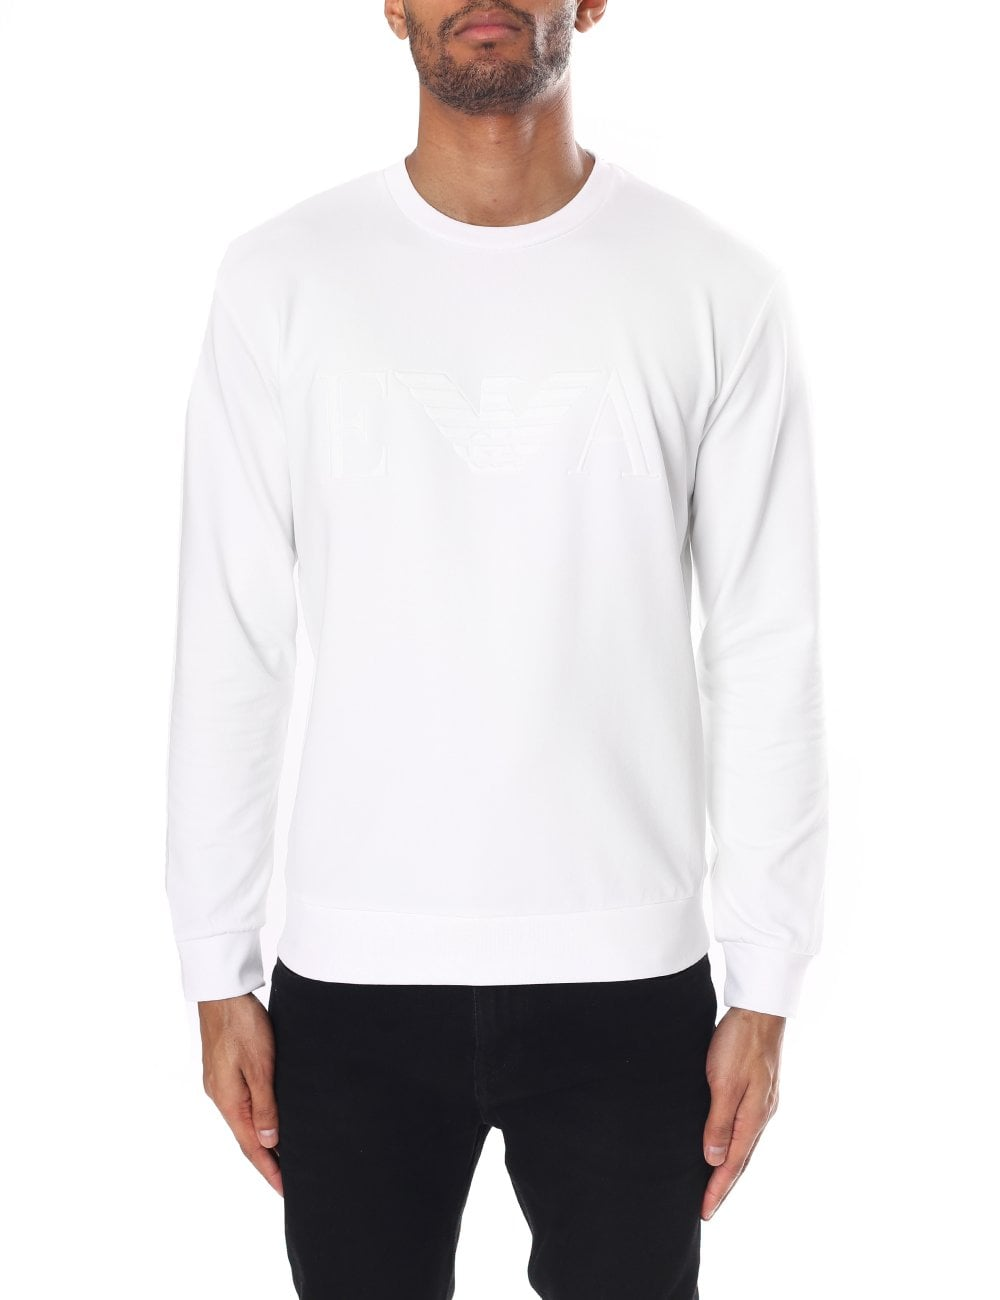 9506615364 Emporio Armani Embossed Eagle Logo Sweatshirt